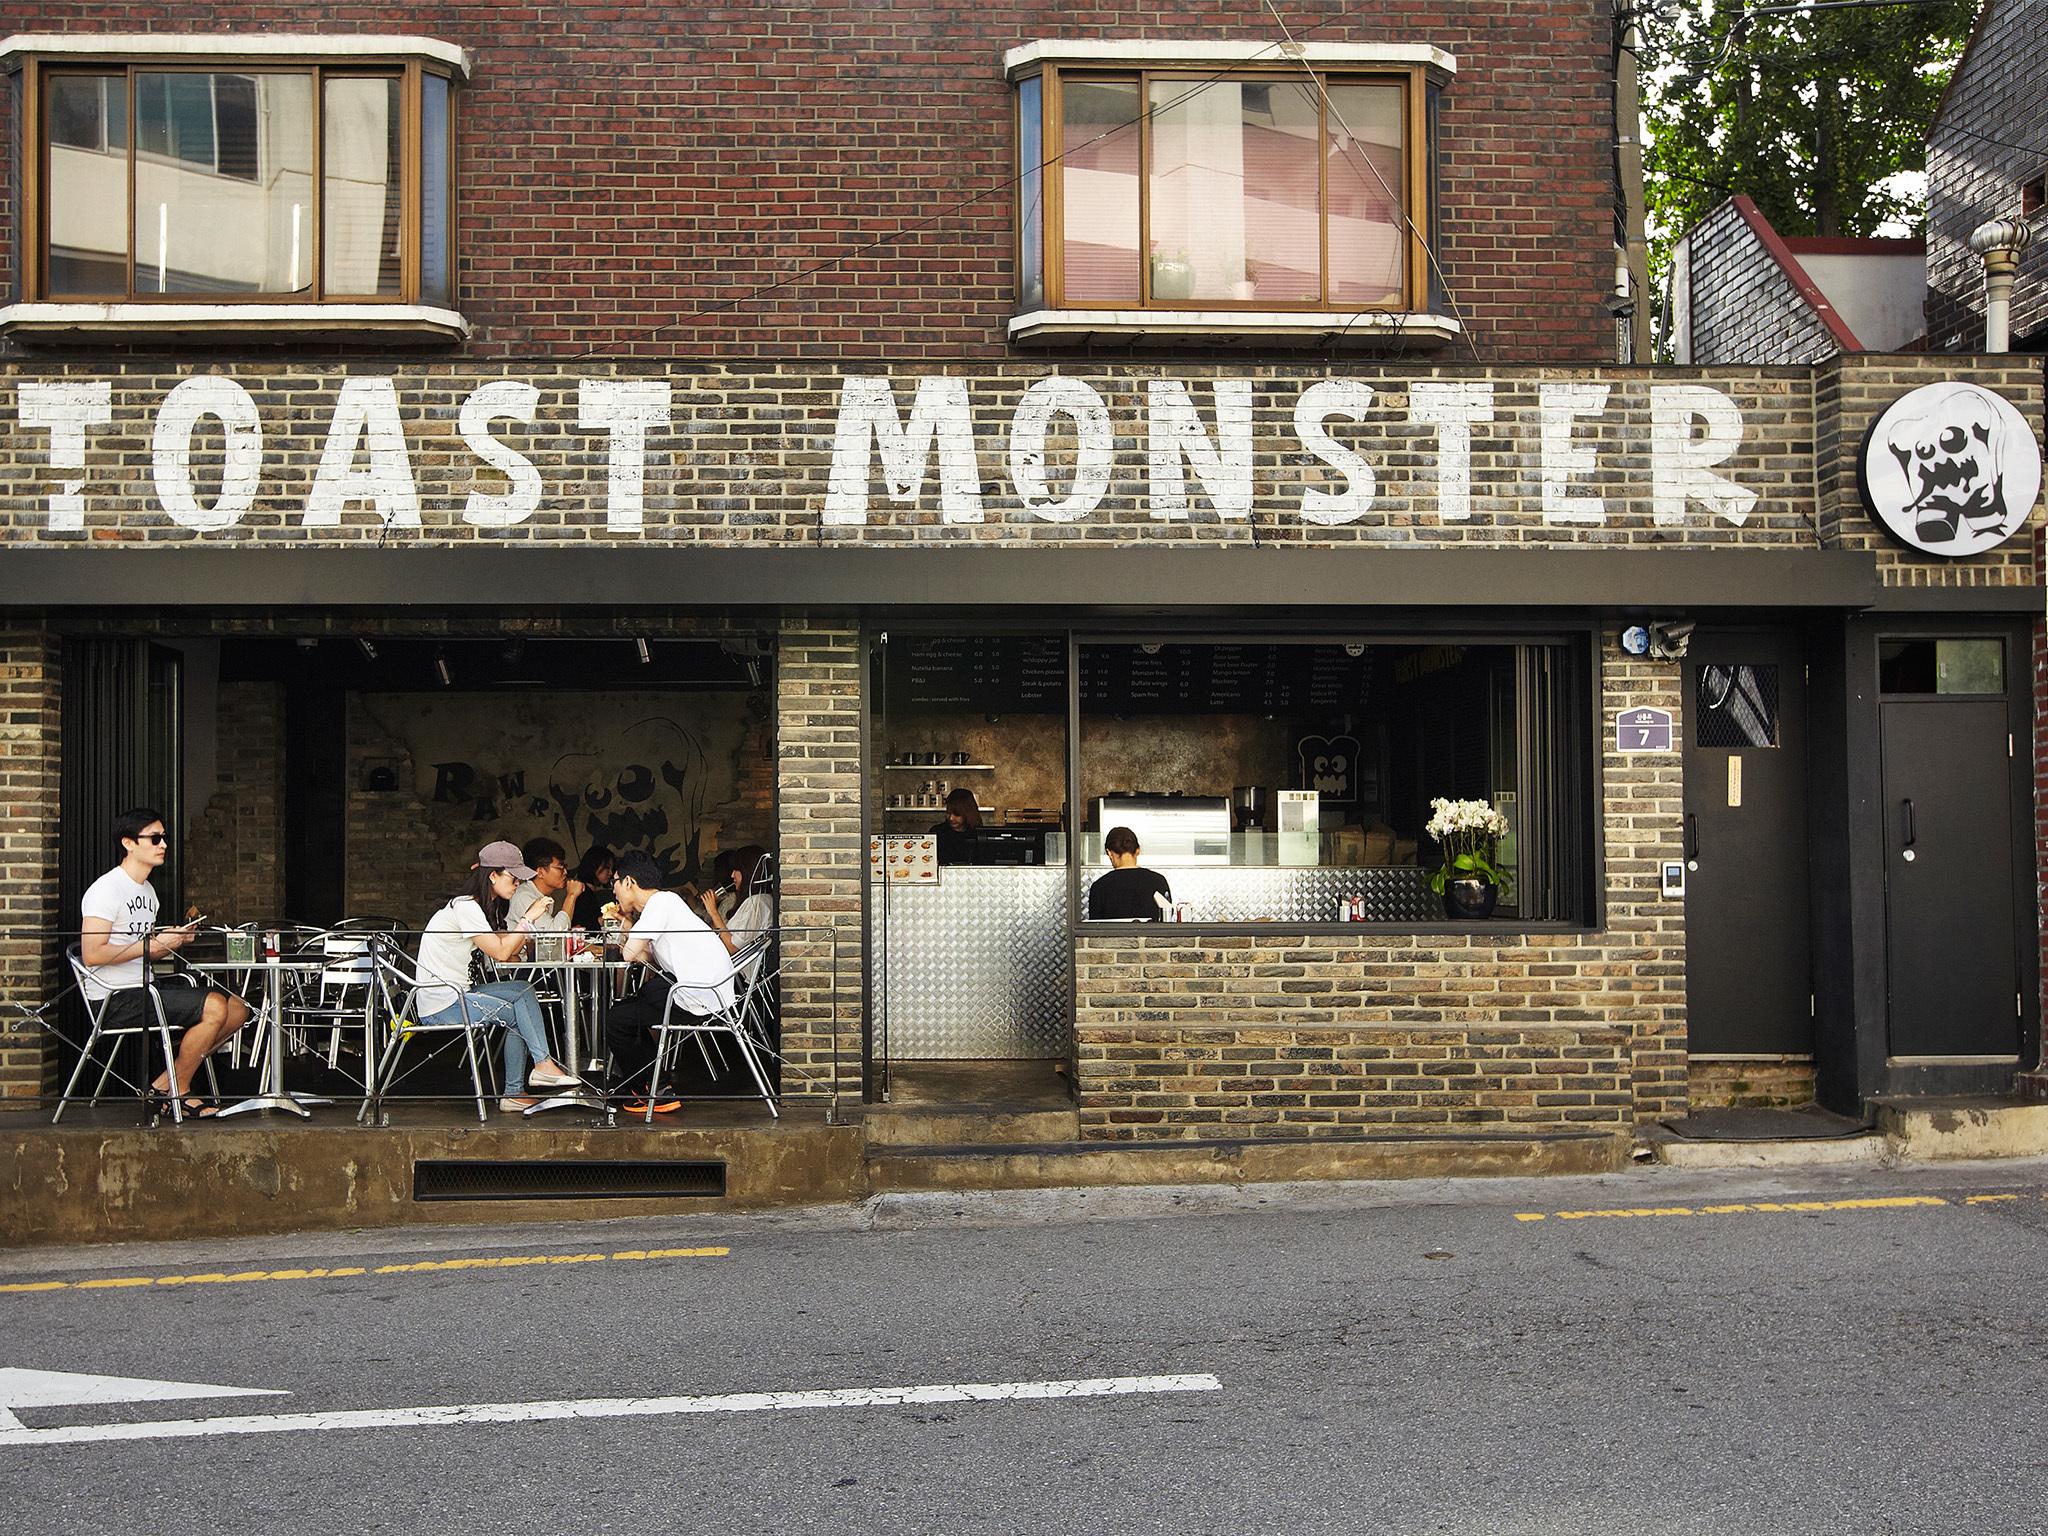 Toast Monster